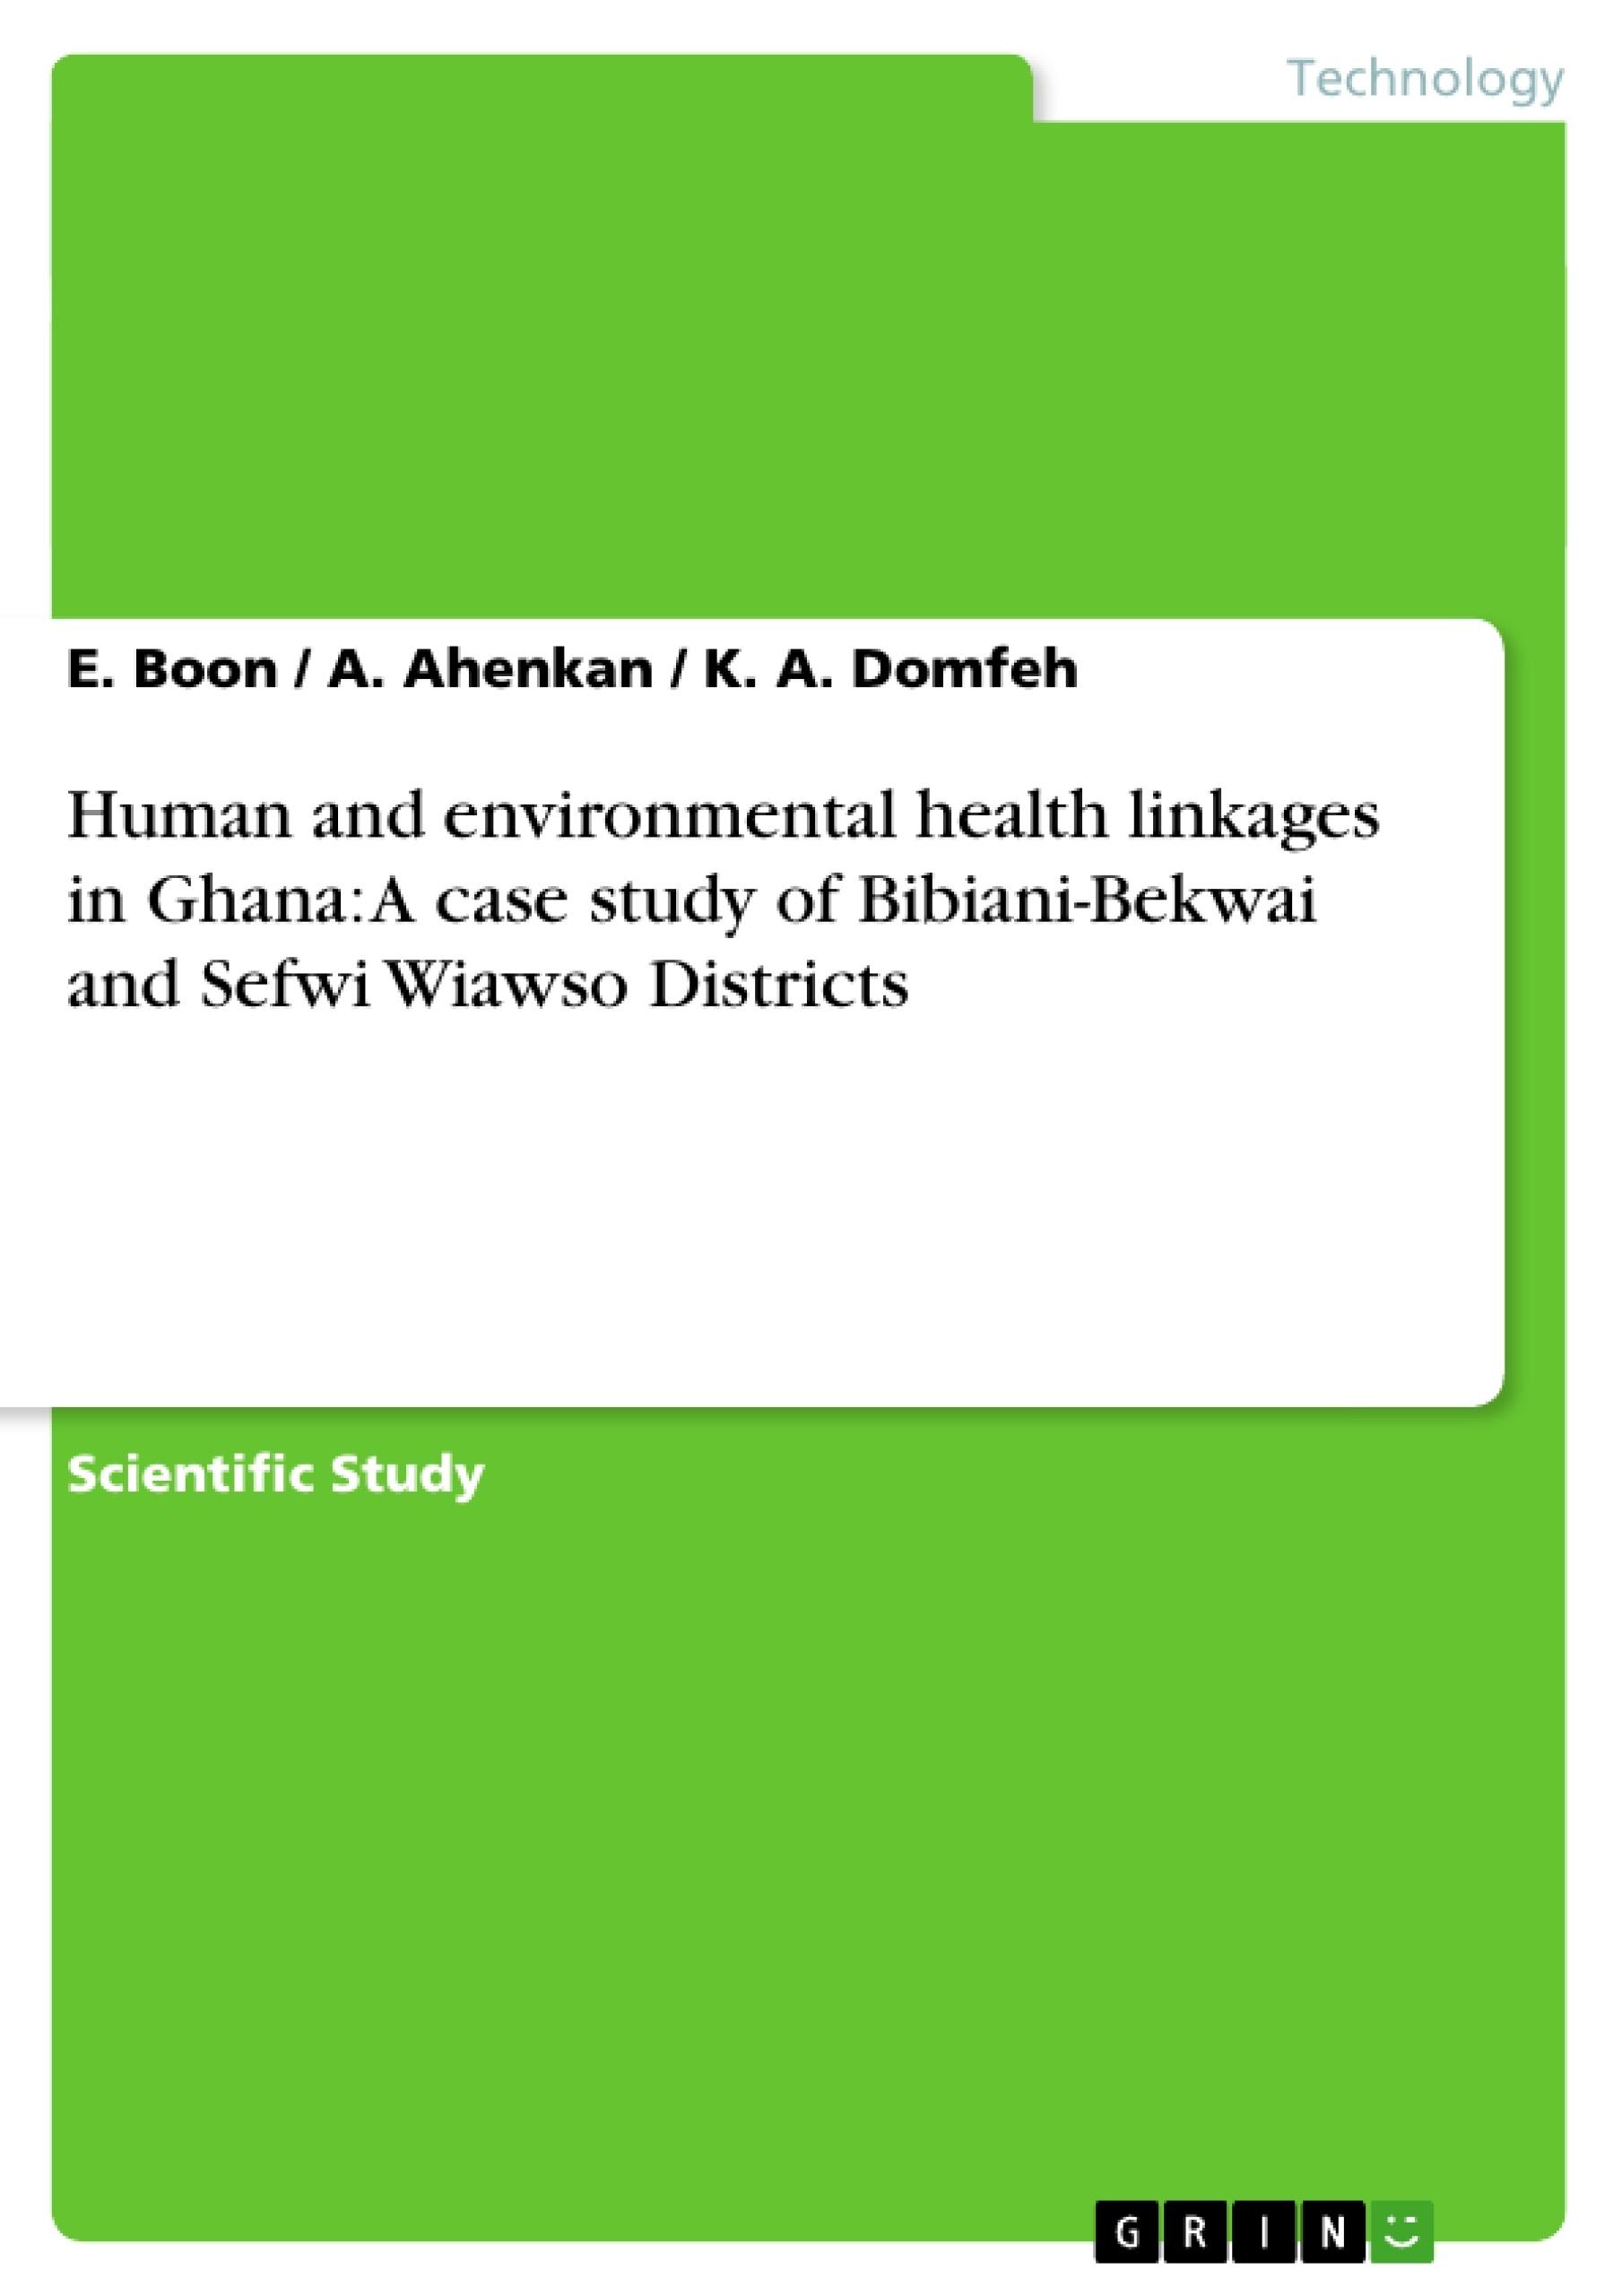 Case Studies in Environmental Medicine